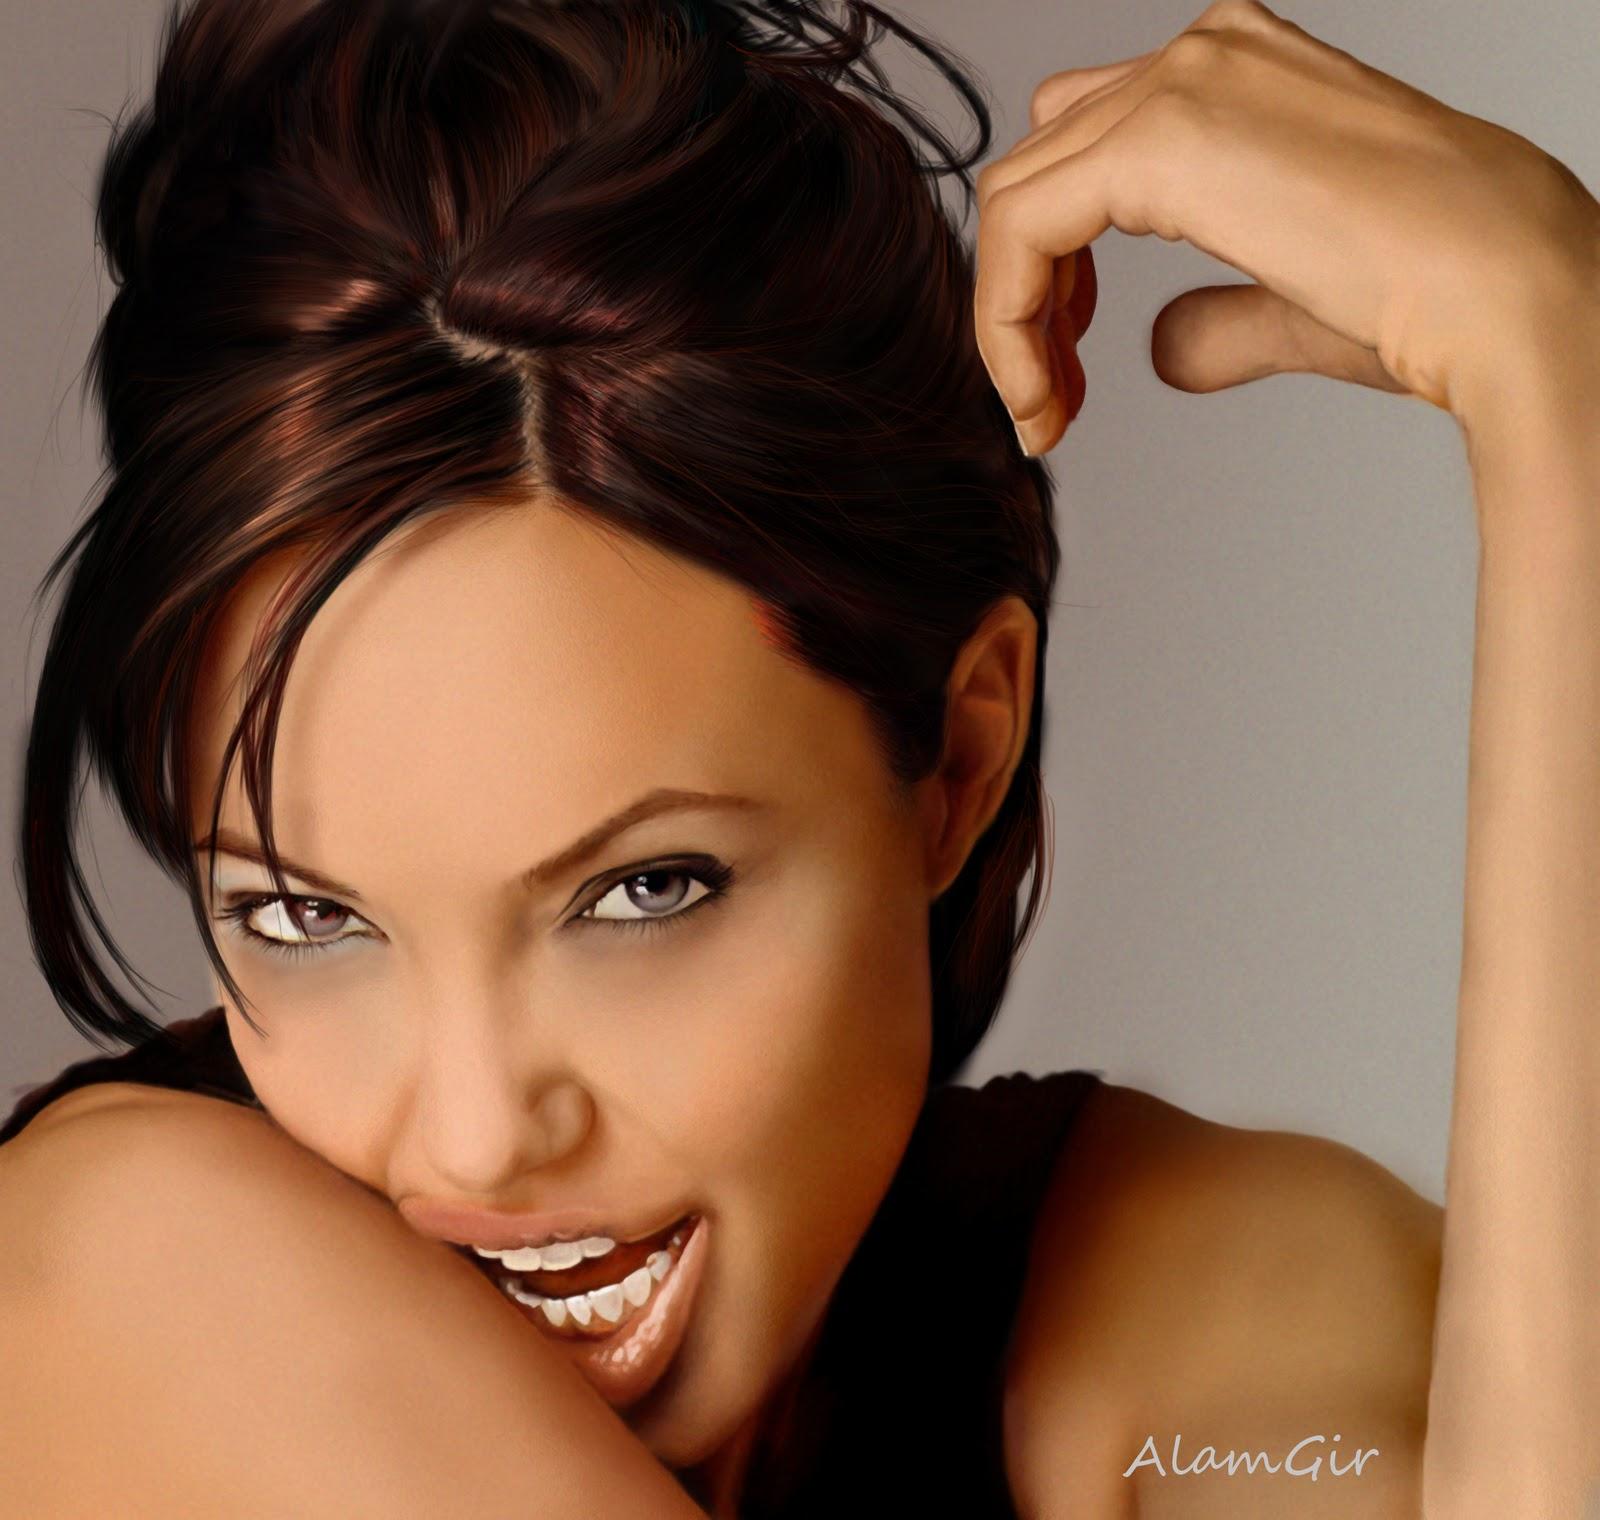 http://3.bp.blogspot.com/-TapMVwgka3c/TwVc31vKtAI/AAAAAAAAAEY/-g4vSyq4IGc/s1600/angelina-jolie-+copy.jpg